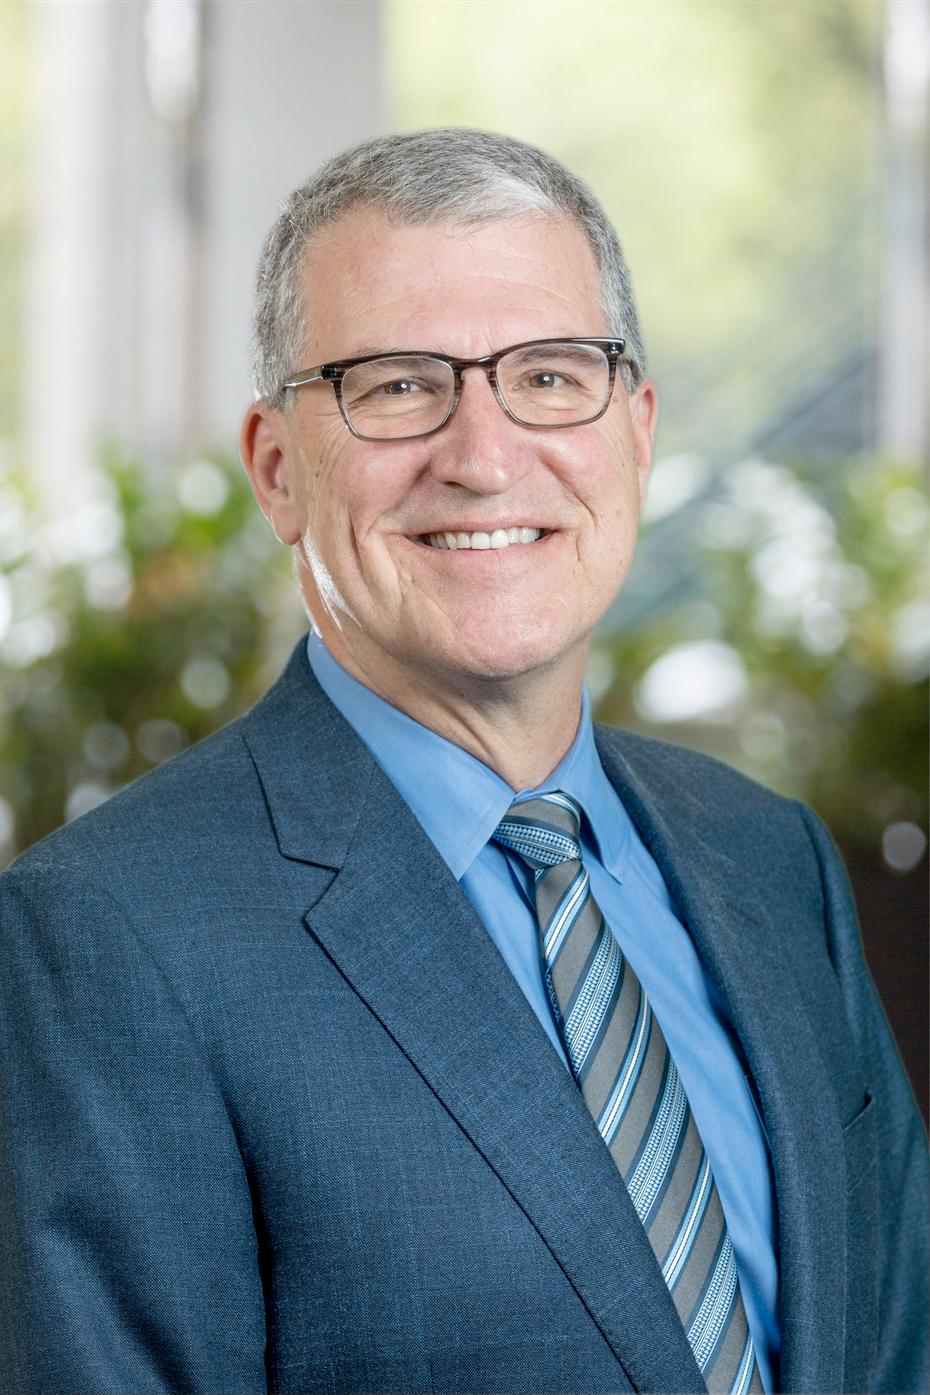 John Josey, former CEO and president of Peloton Therapeutics.